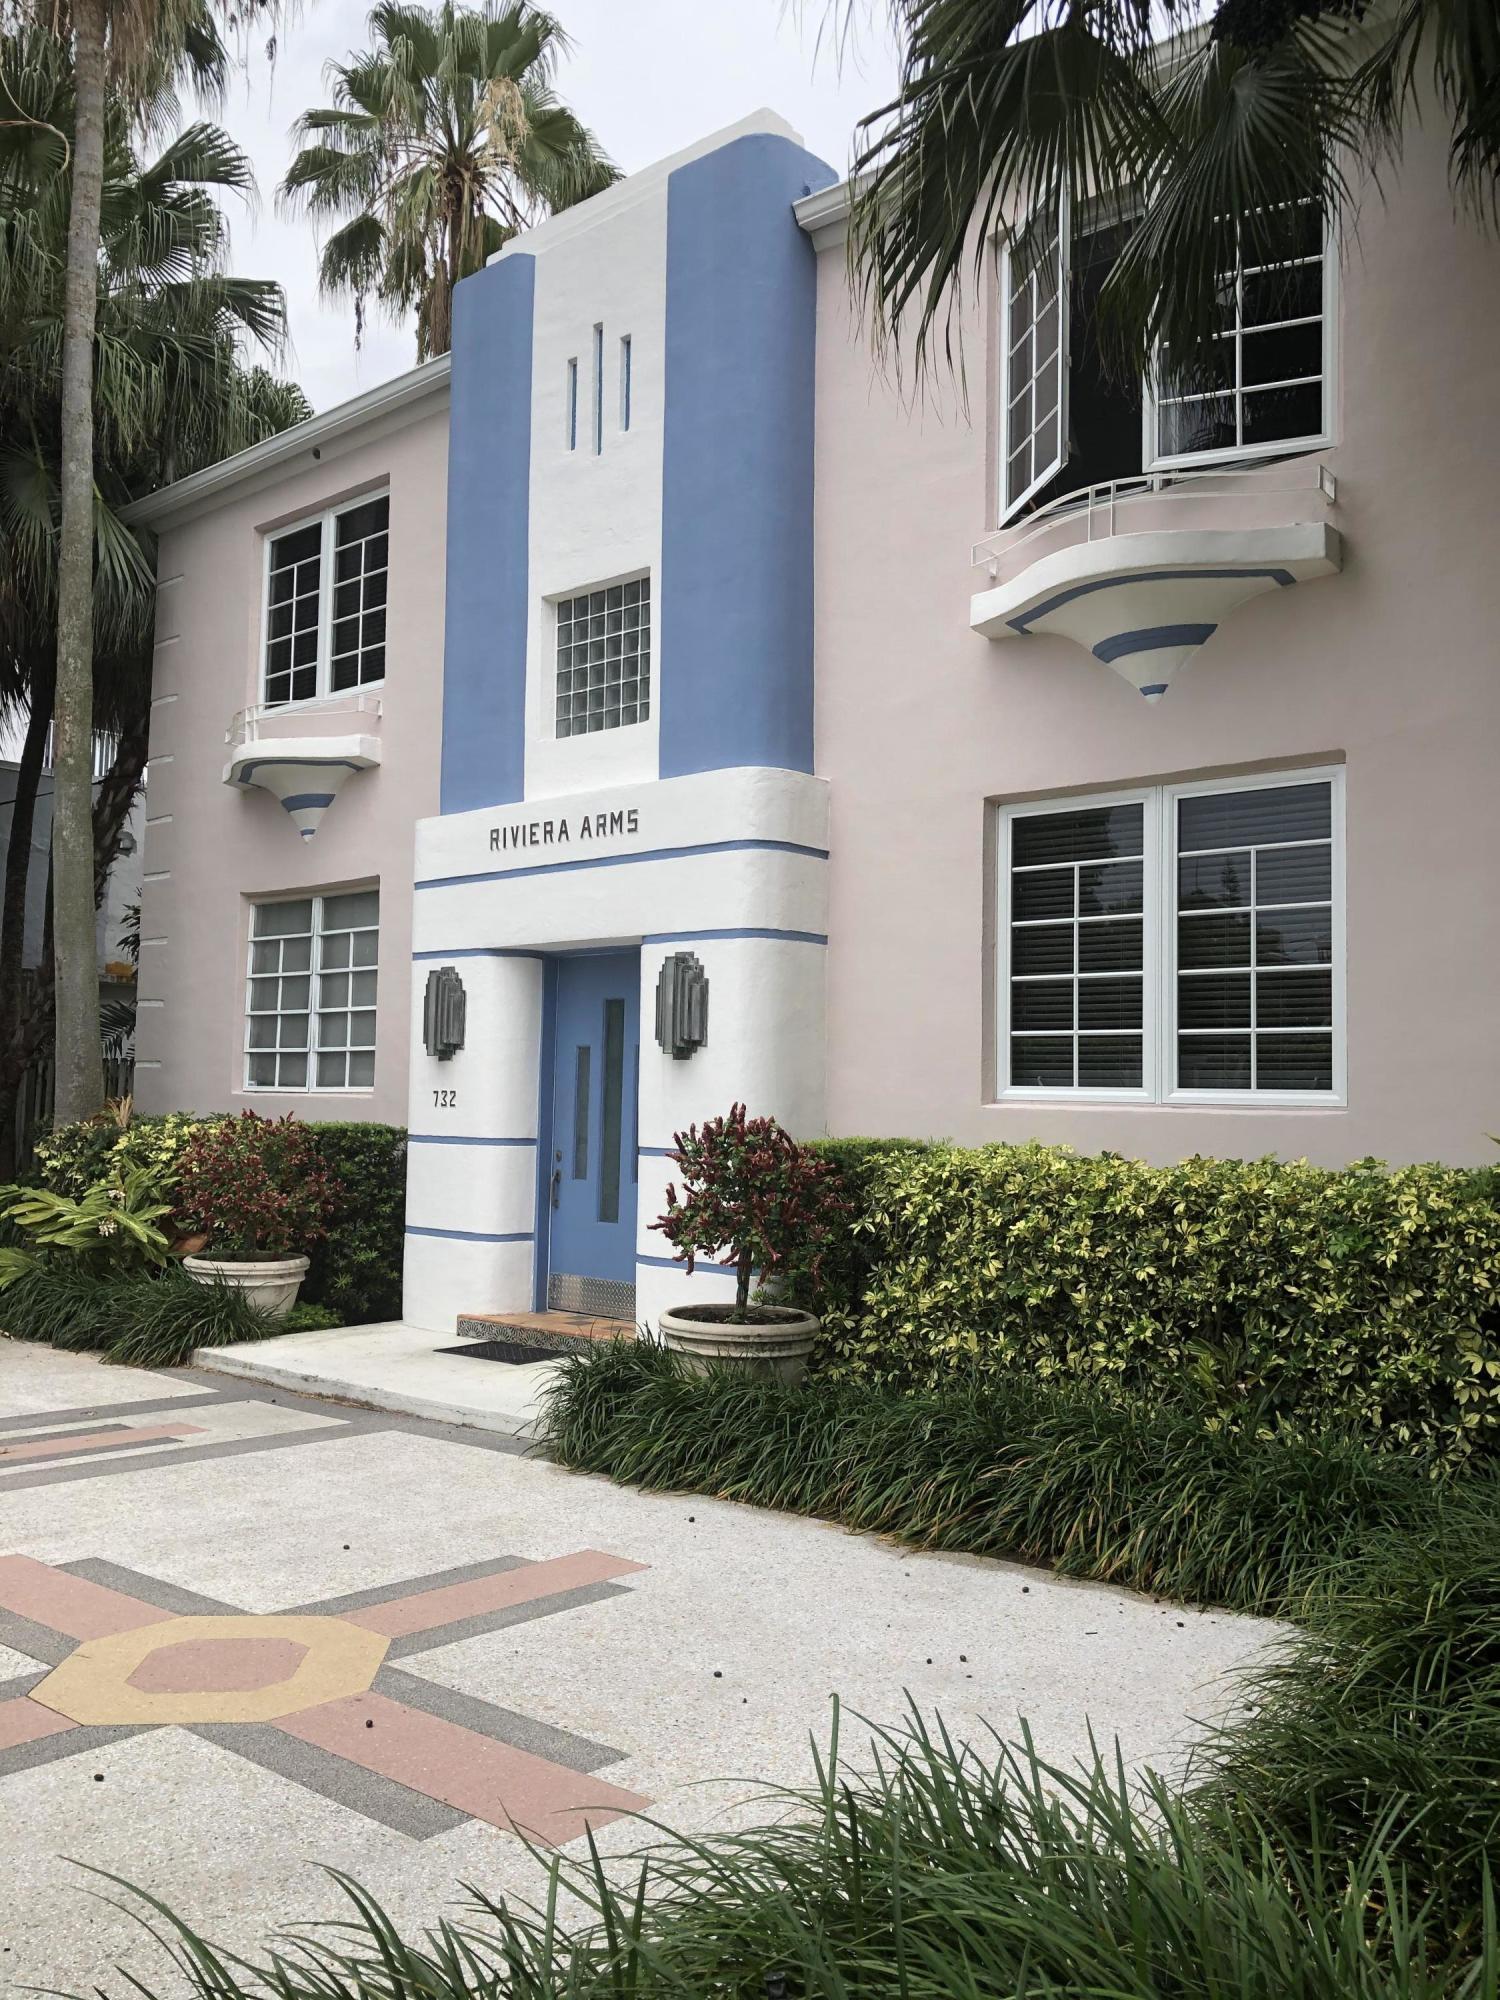 732 Euclid Ave #10, Miami Beach, FL, 33139